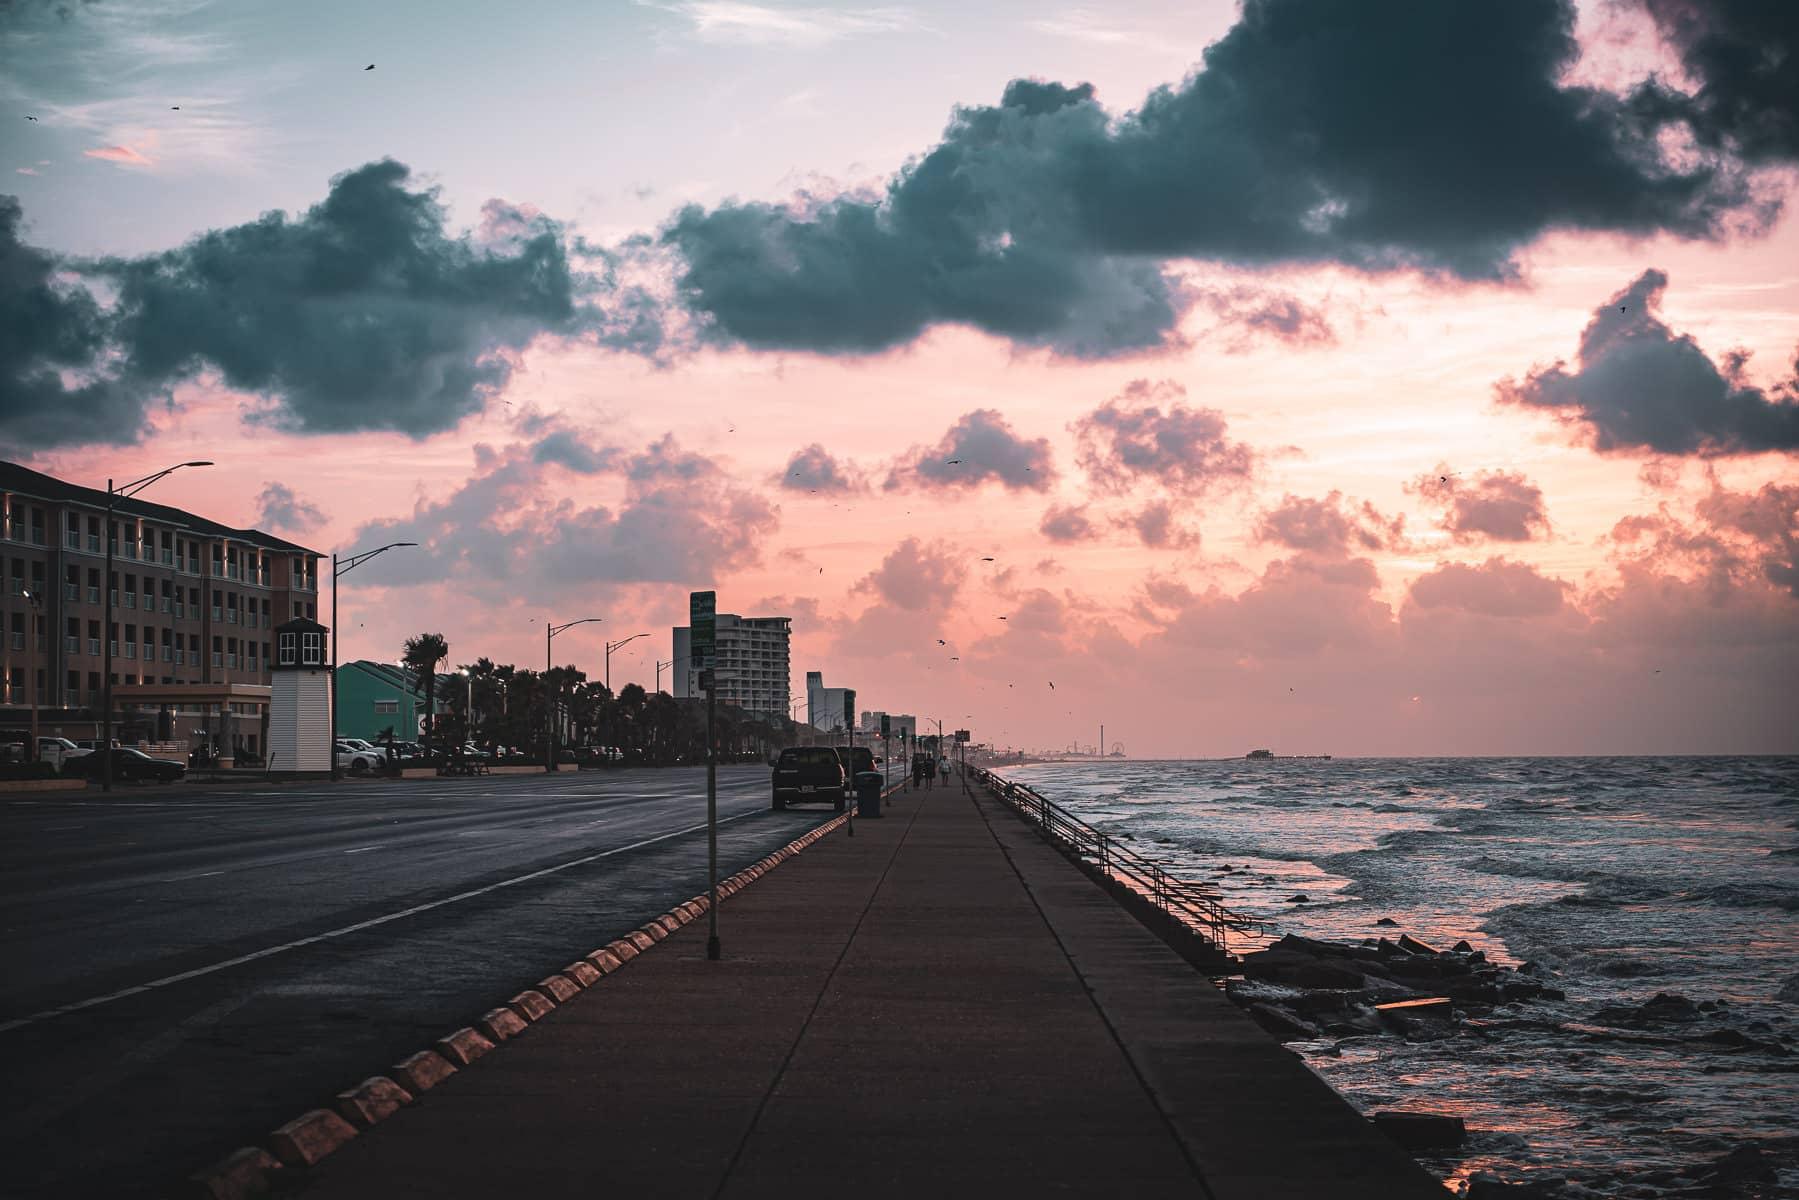 The sun rises on the Galveston, Texas, seawall.